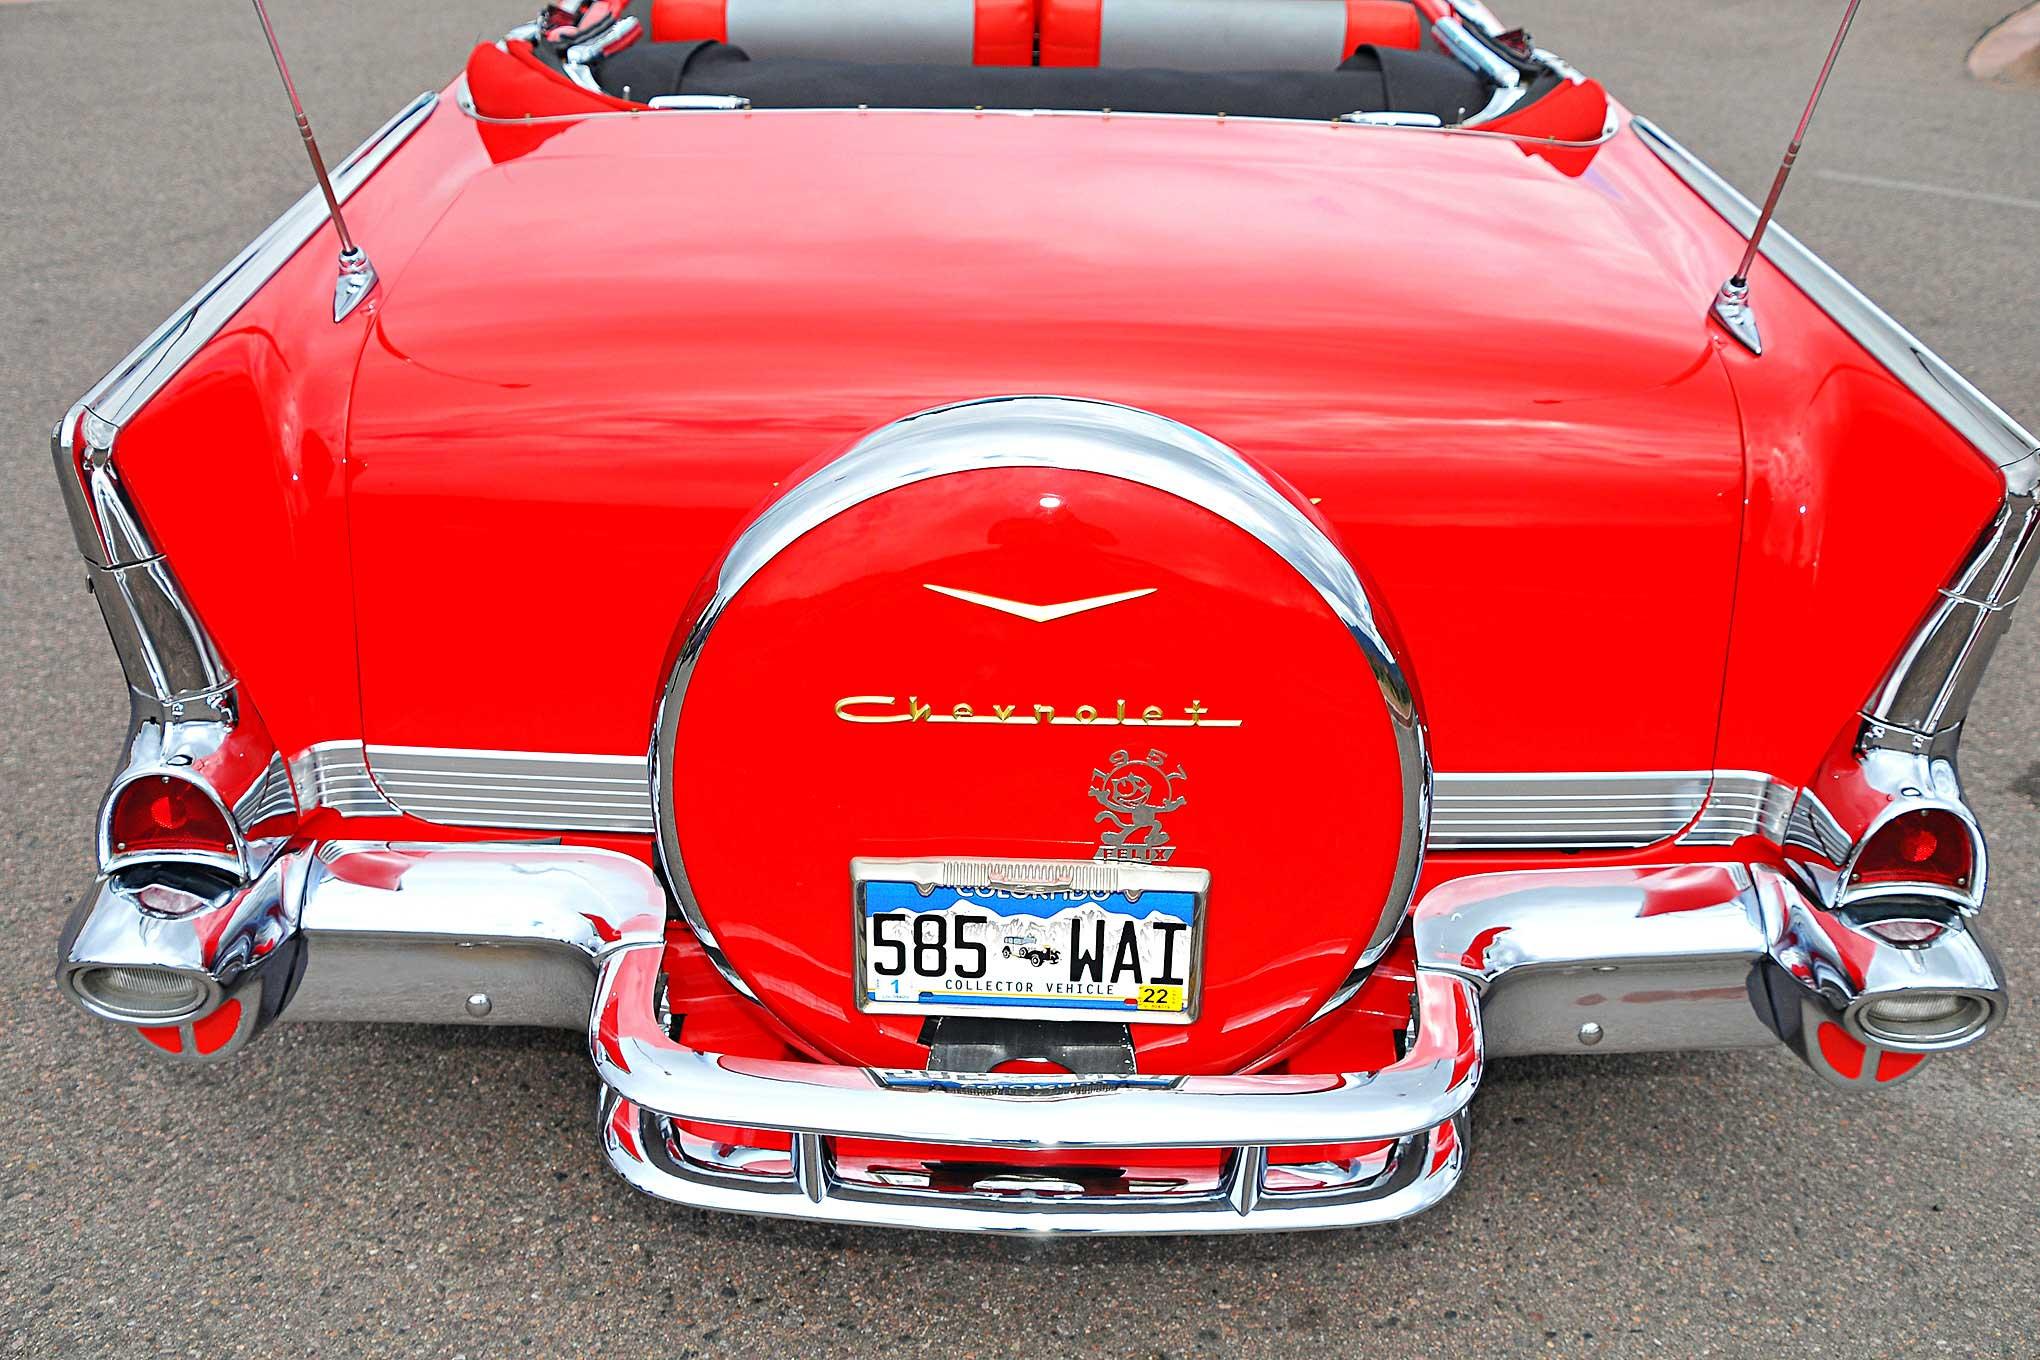 1957 Chevrolet Bel Air - Fire & Desire